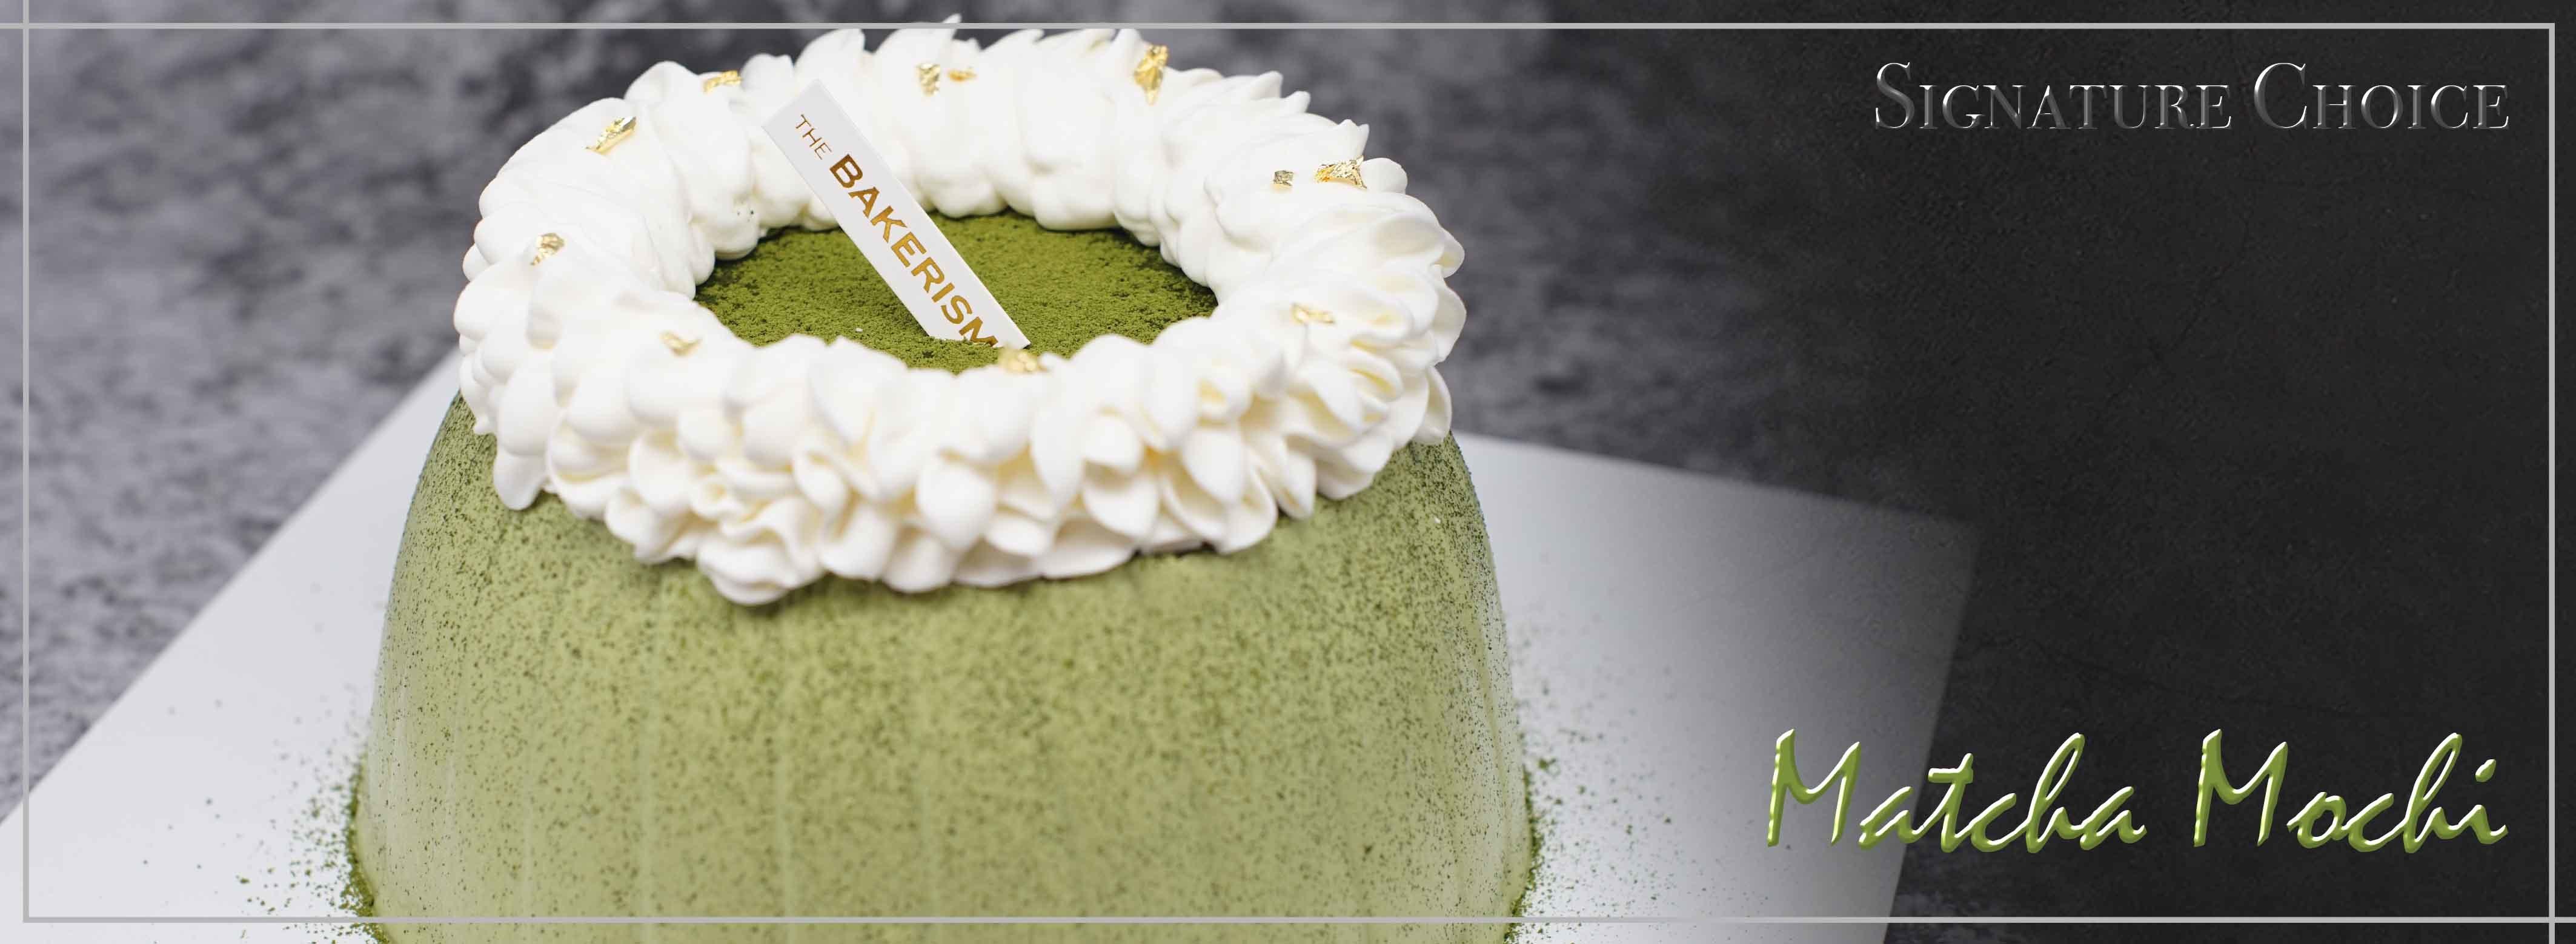 Signature Choice - Matcha Mochi Shortcake